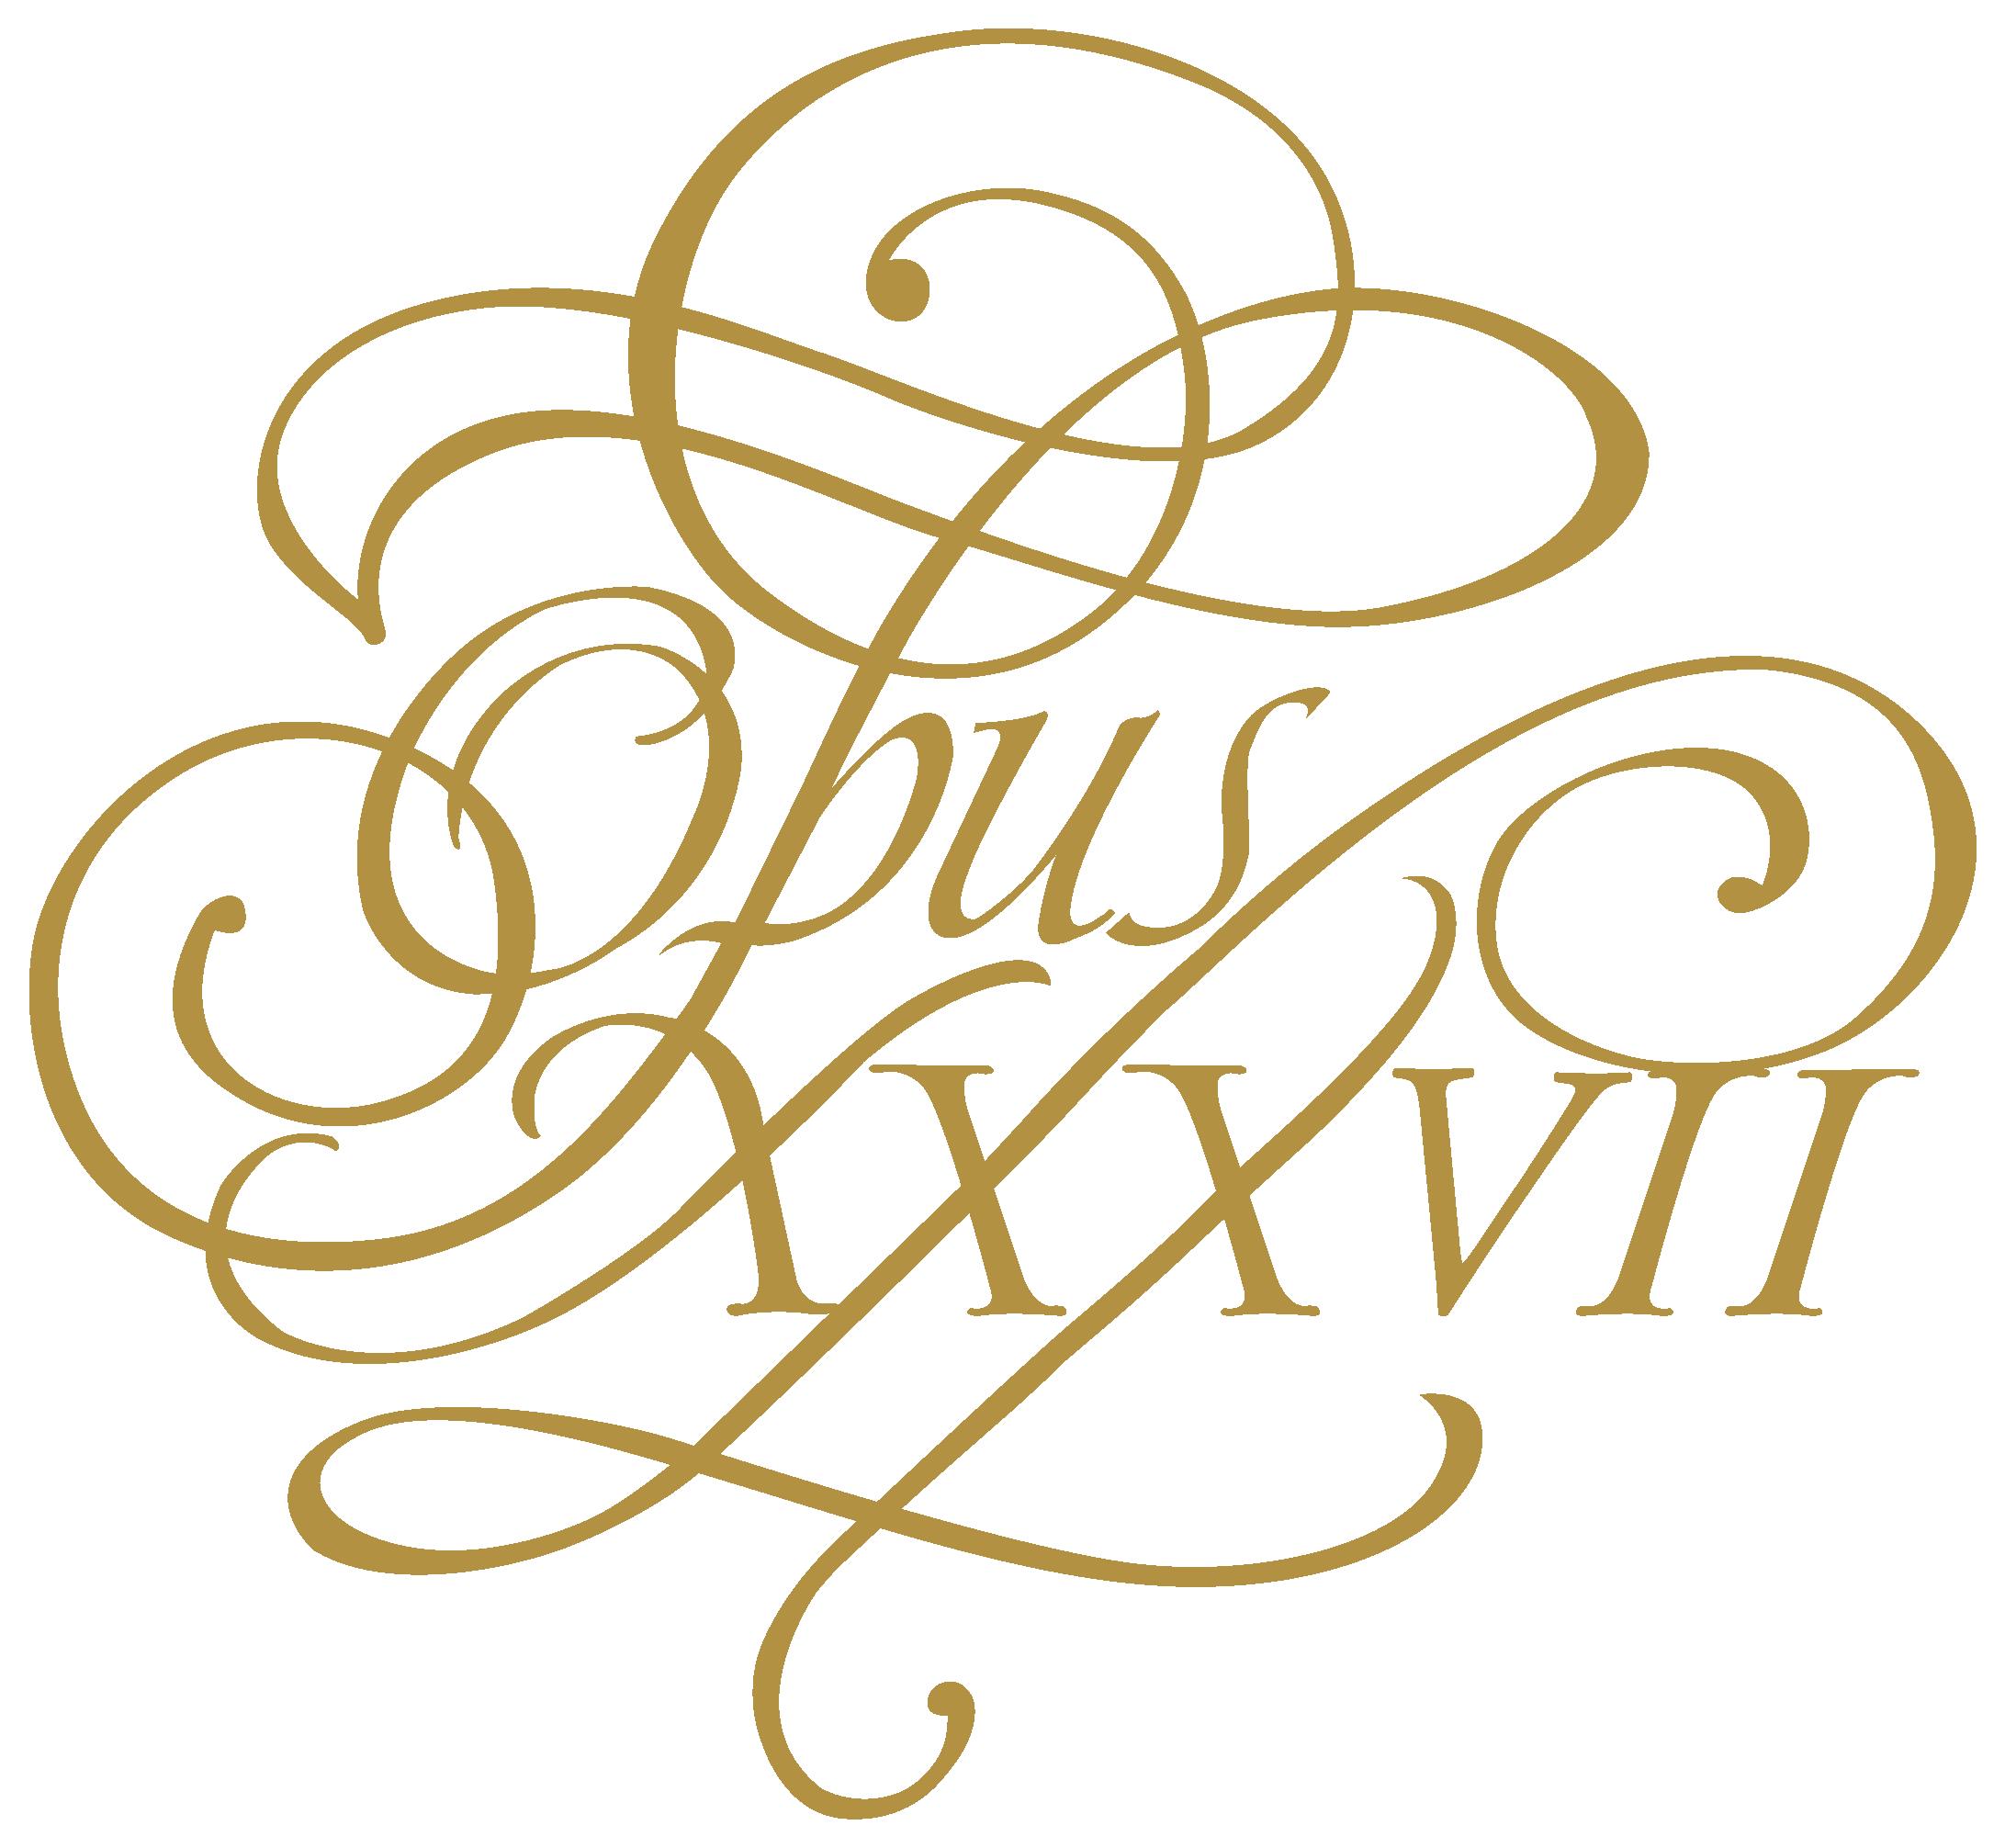 OPUS_XXXVIII_Logos_Gold.png